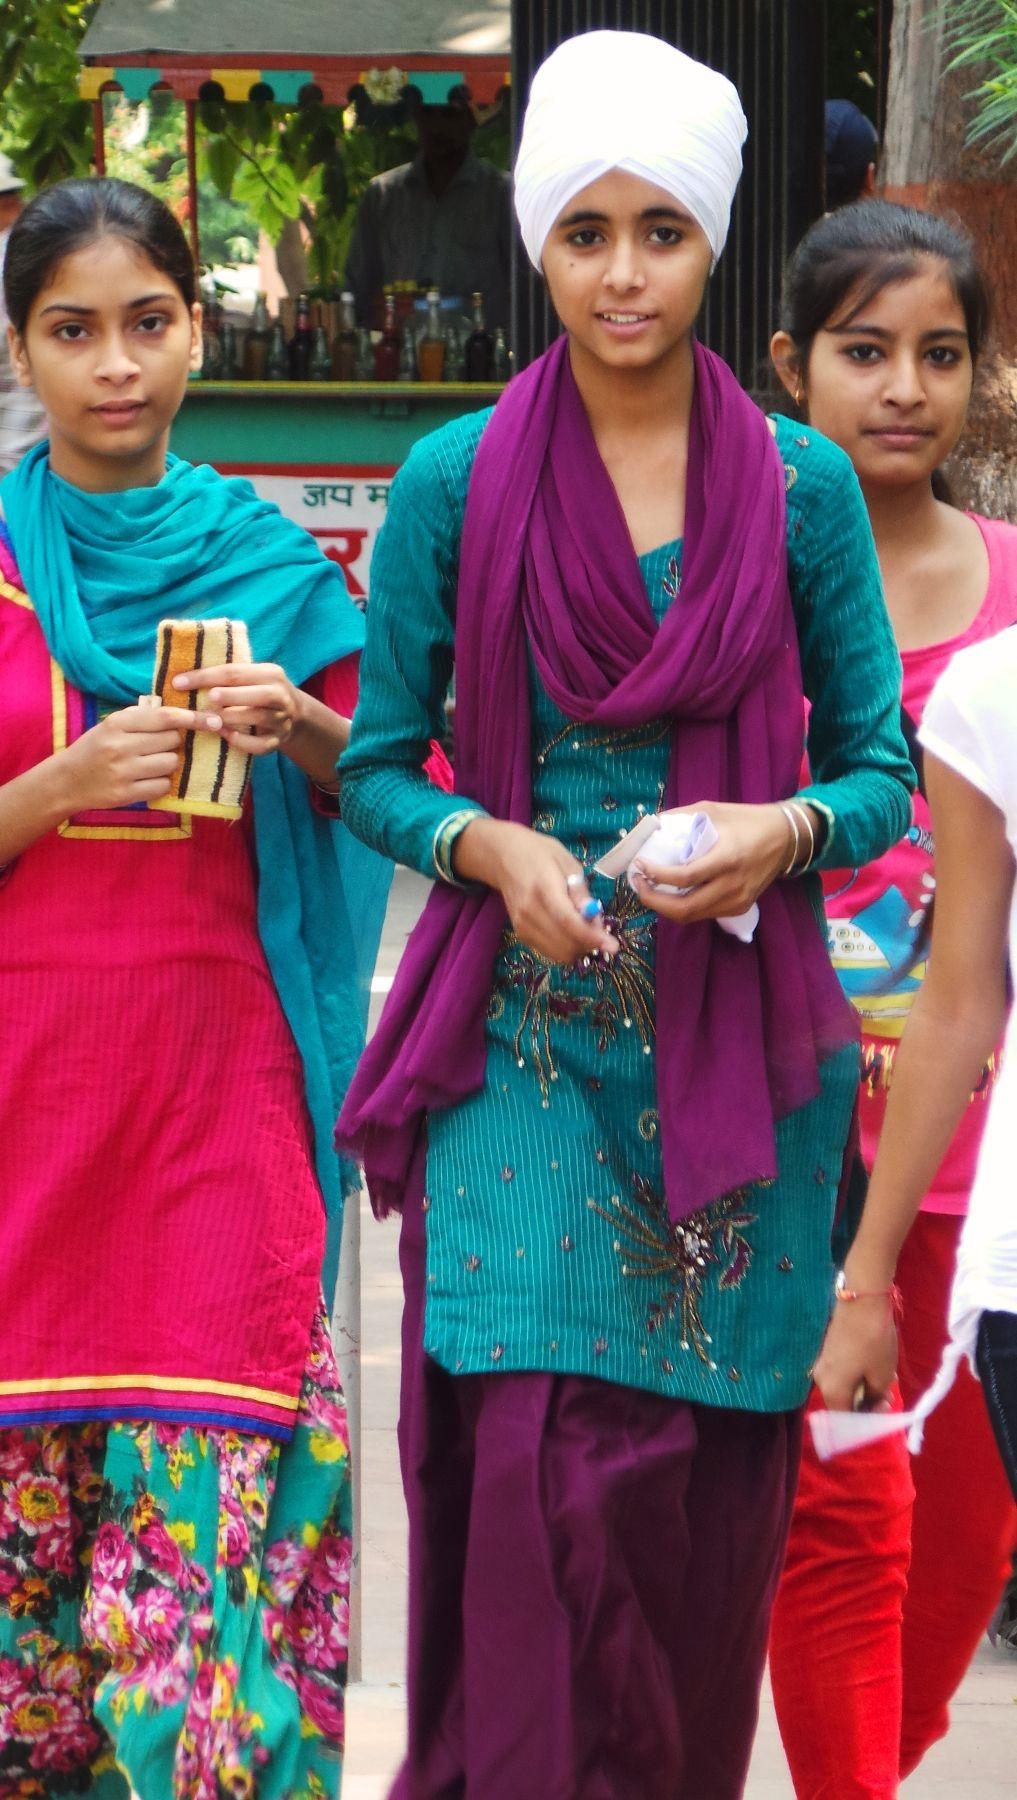 Amritsar girls